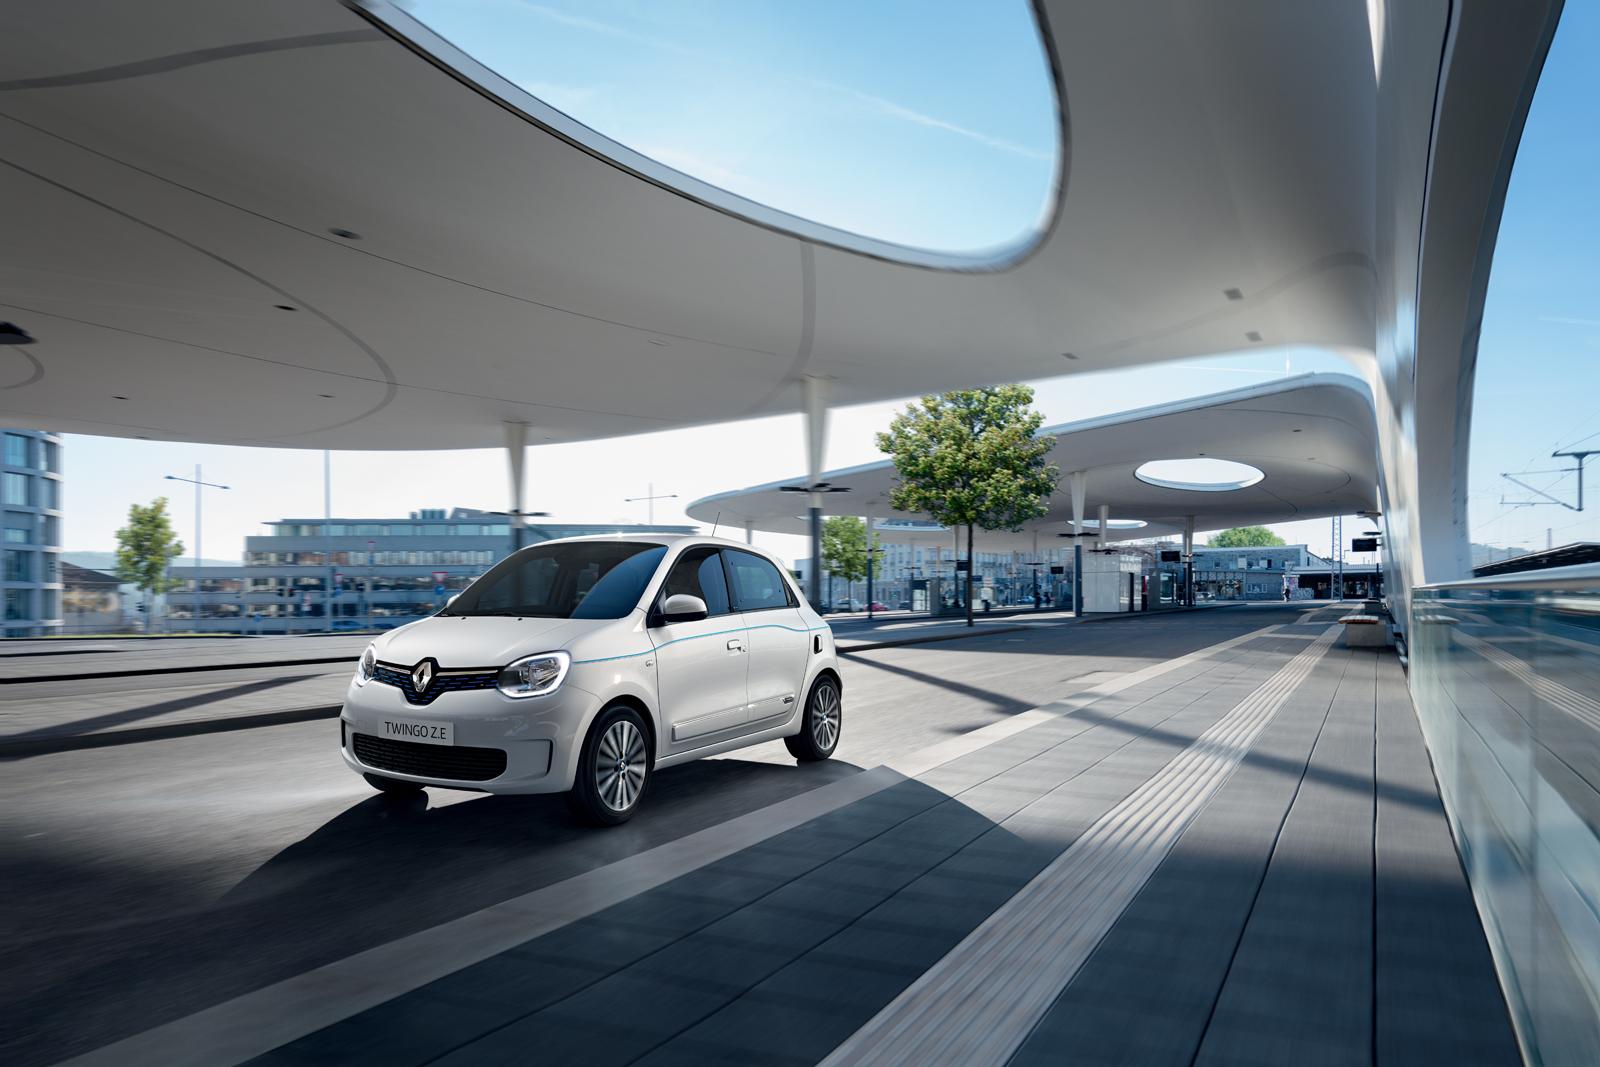 2020 Renault Twingo ZE 25